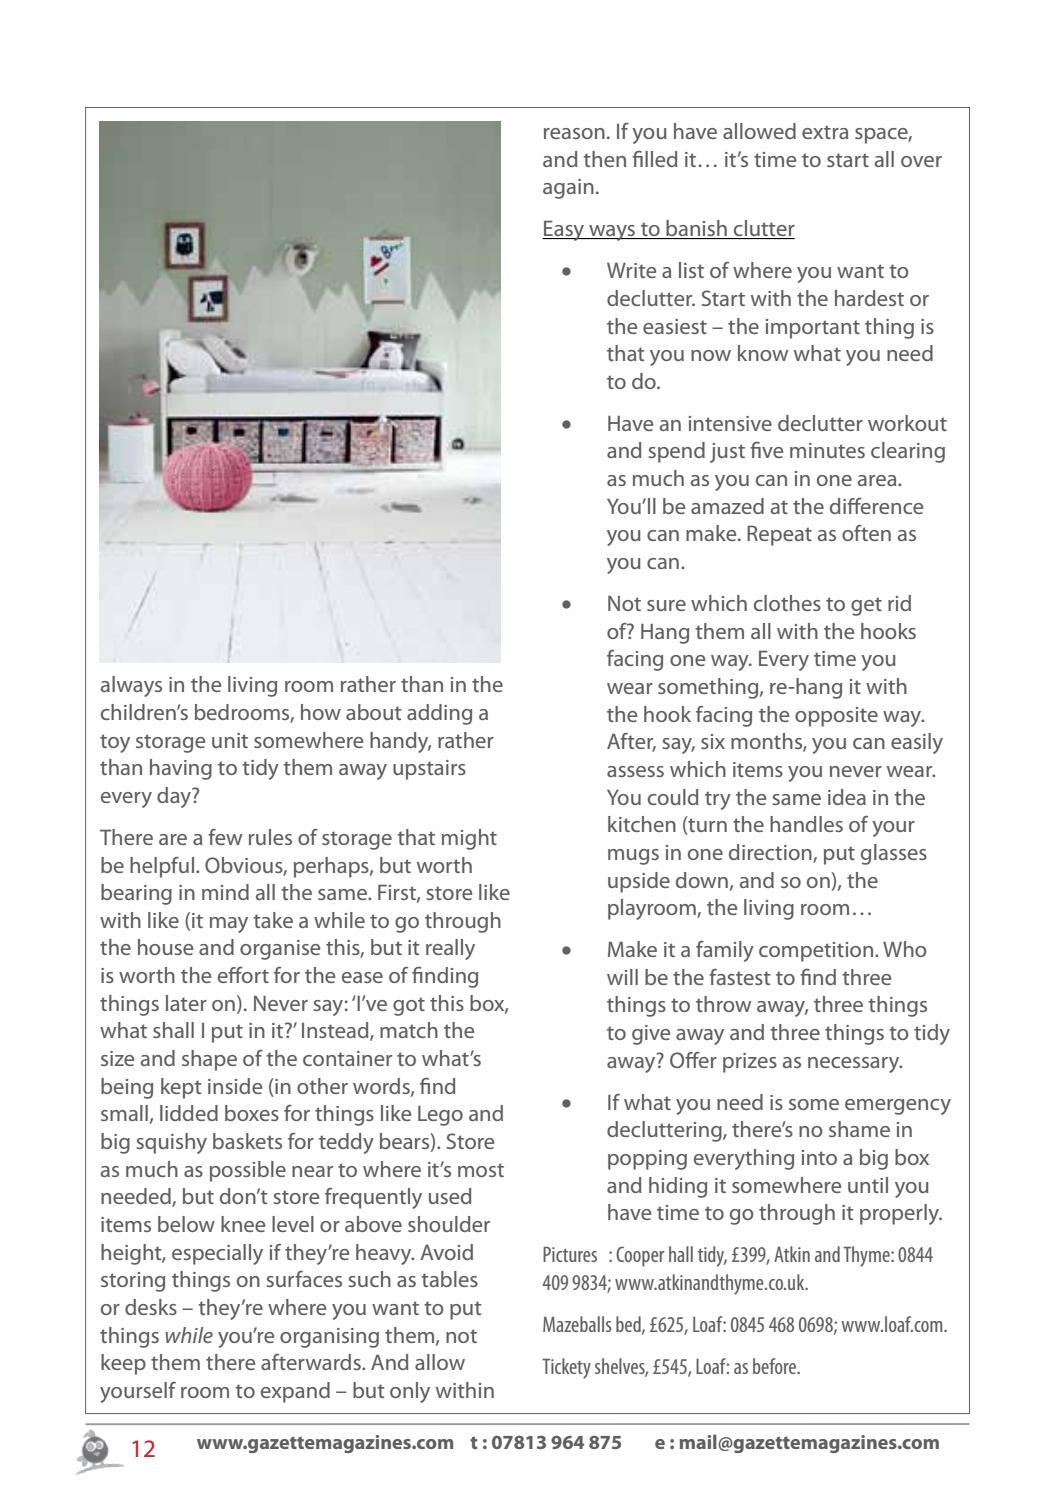 Web issue 113 WE1 by gazette magazines - issuu